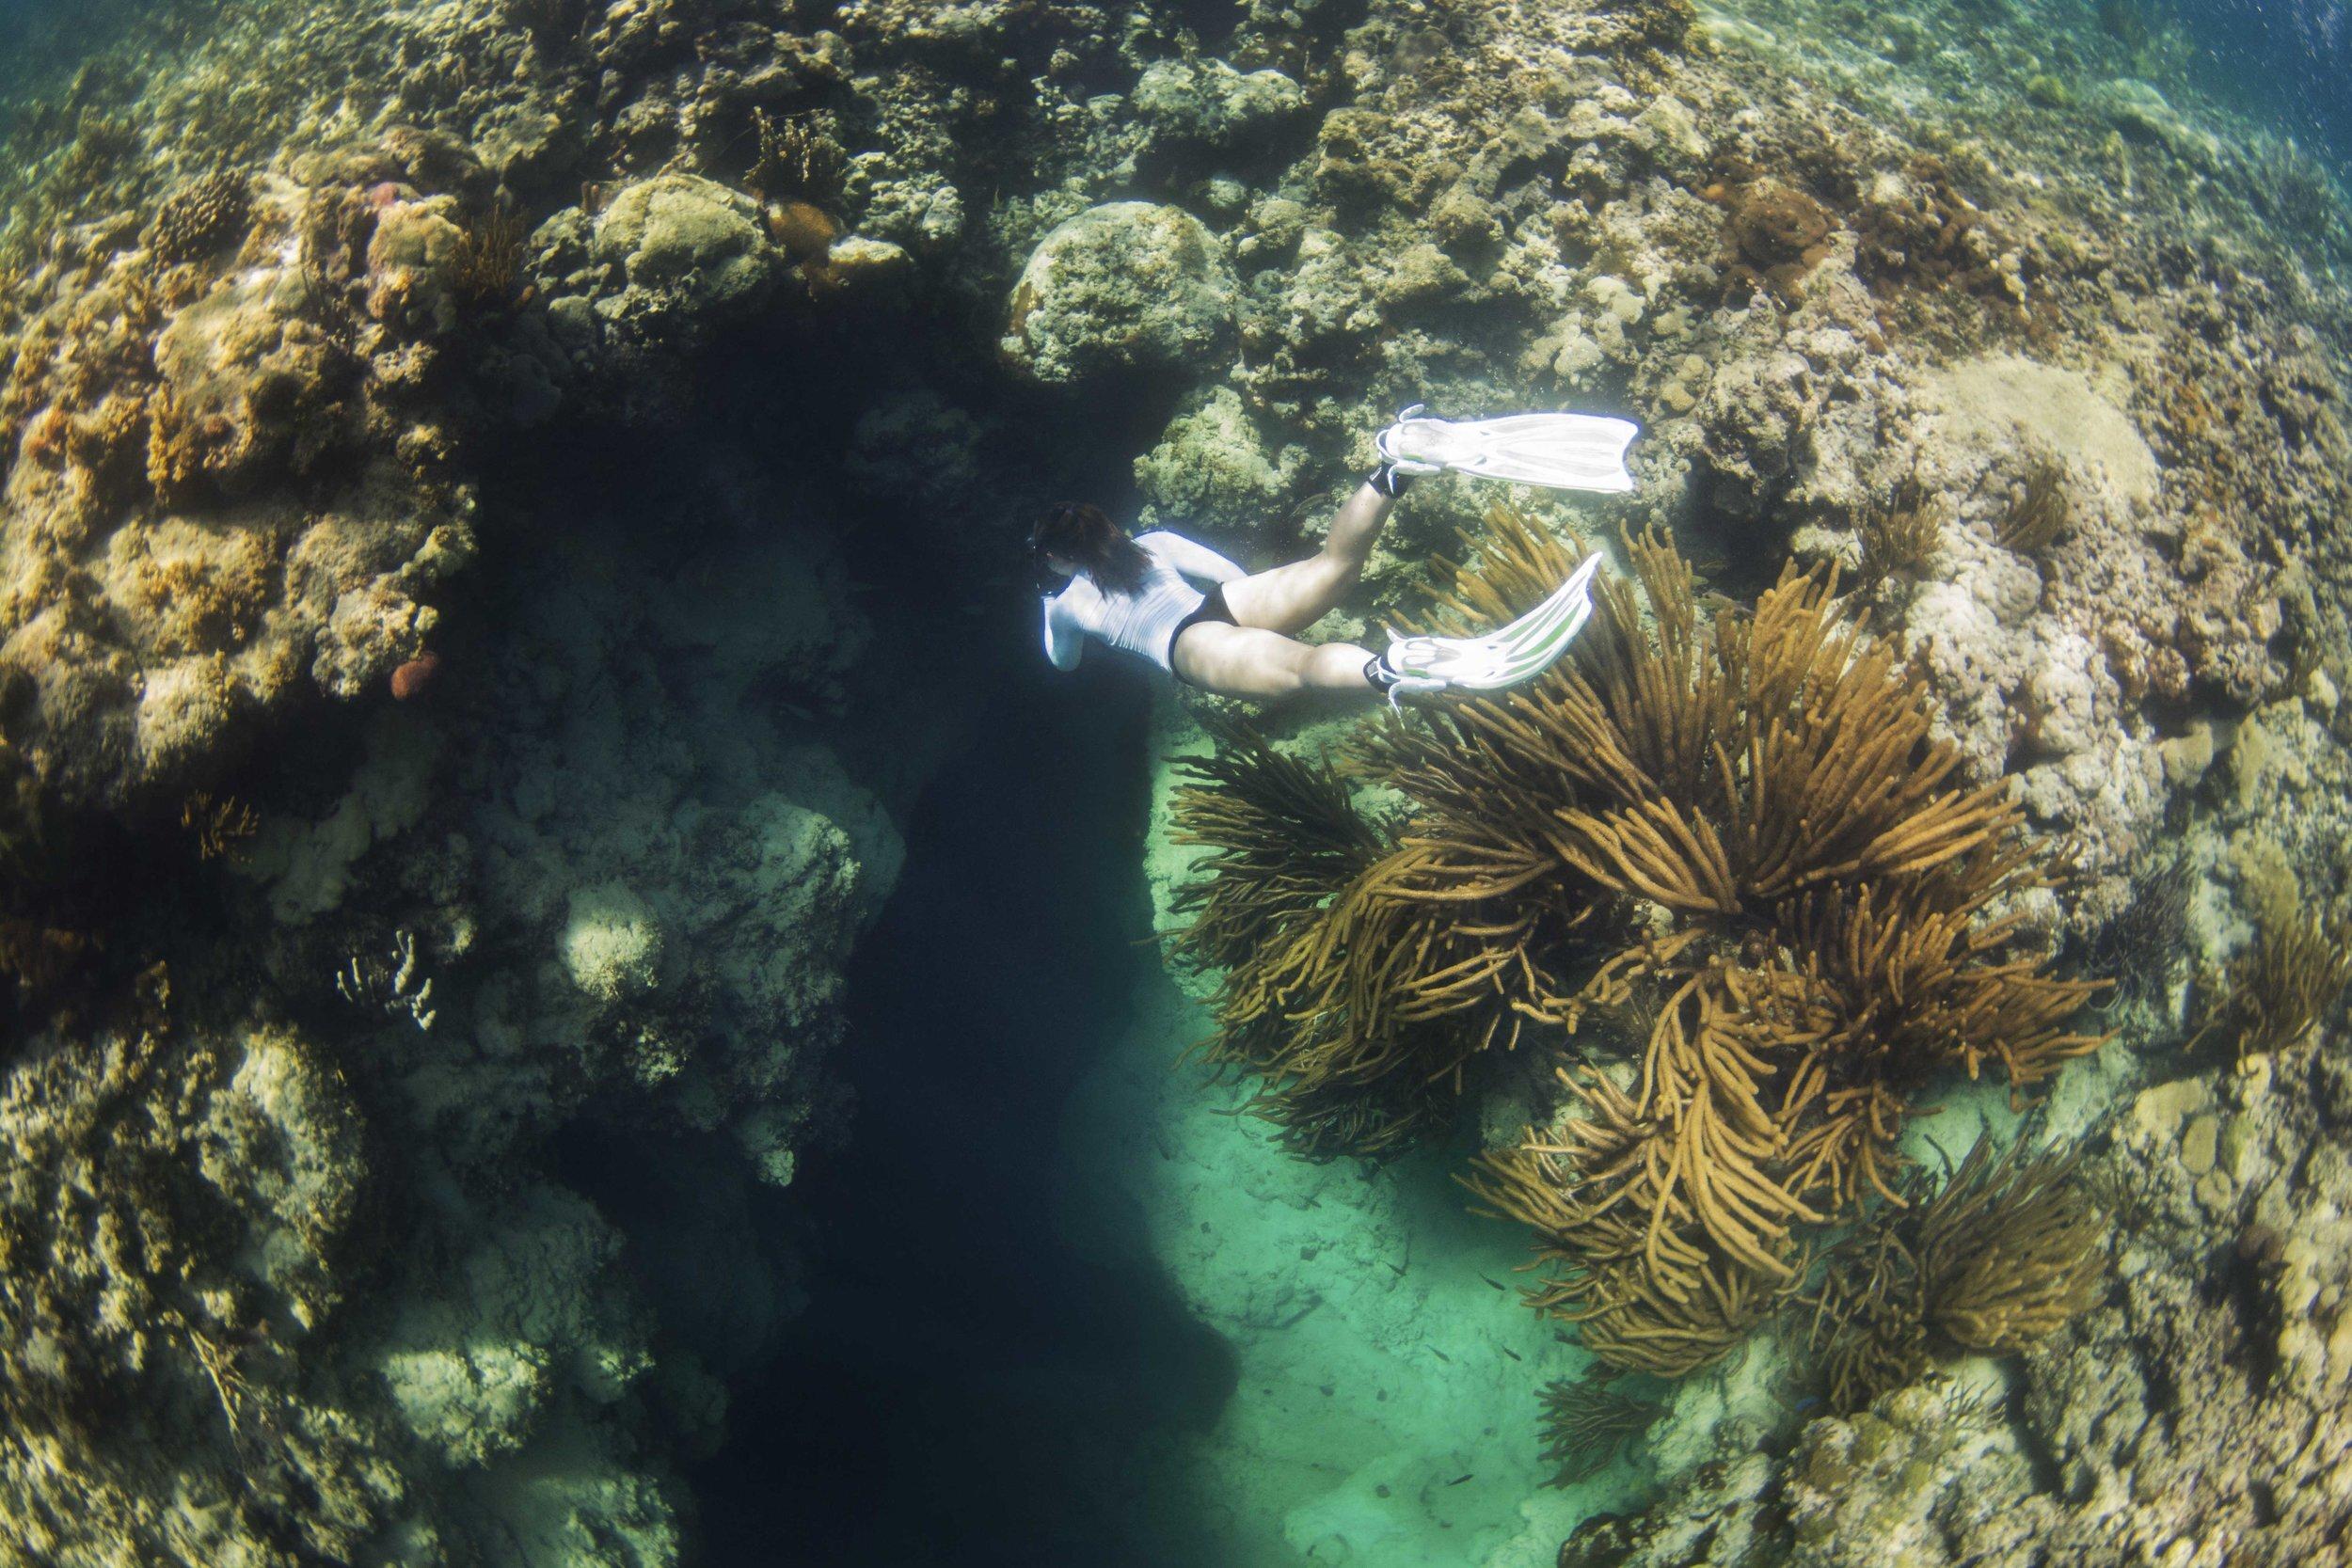 Silent Hunter - Annie Dr Tristan Guttridge -Sharks - Shark - Hammerhead - The Bahamas - Andros - Shark Diving - Eco - Eco Tourism - Blue Hole - Diving.jpg